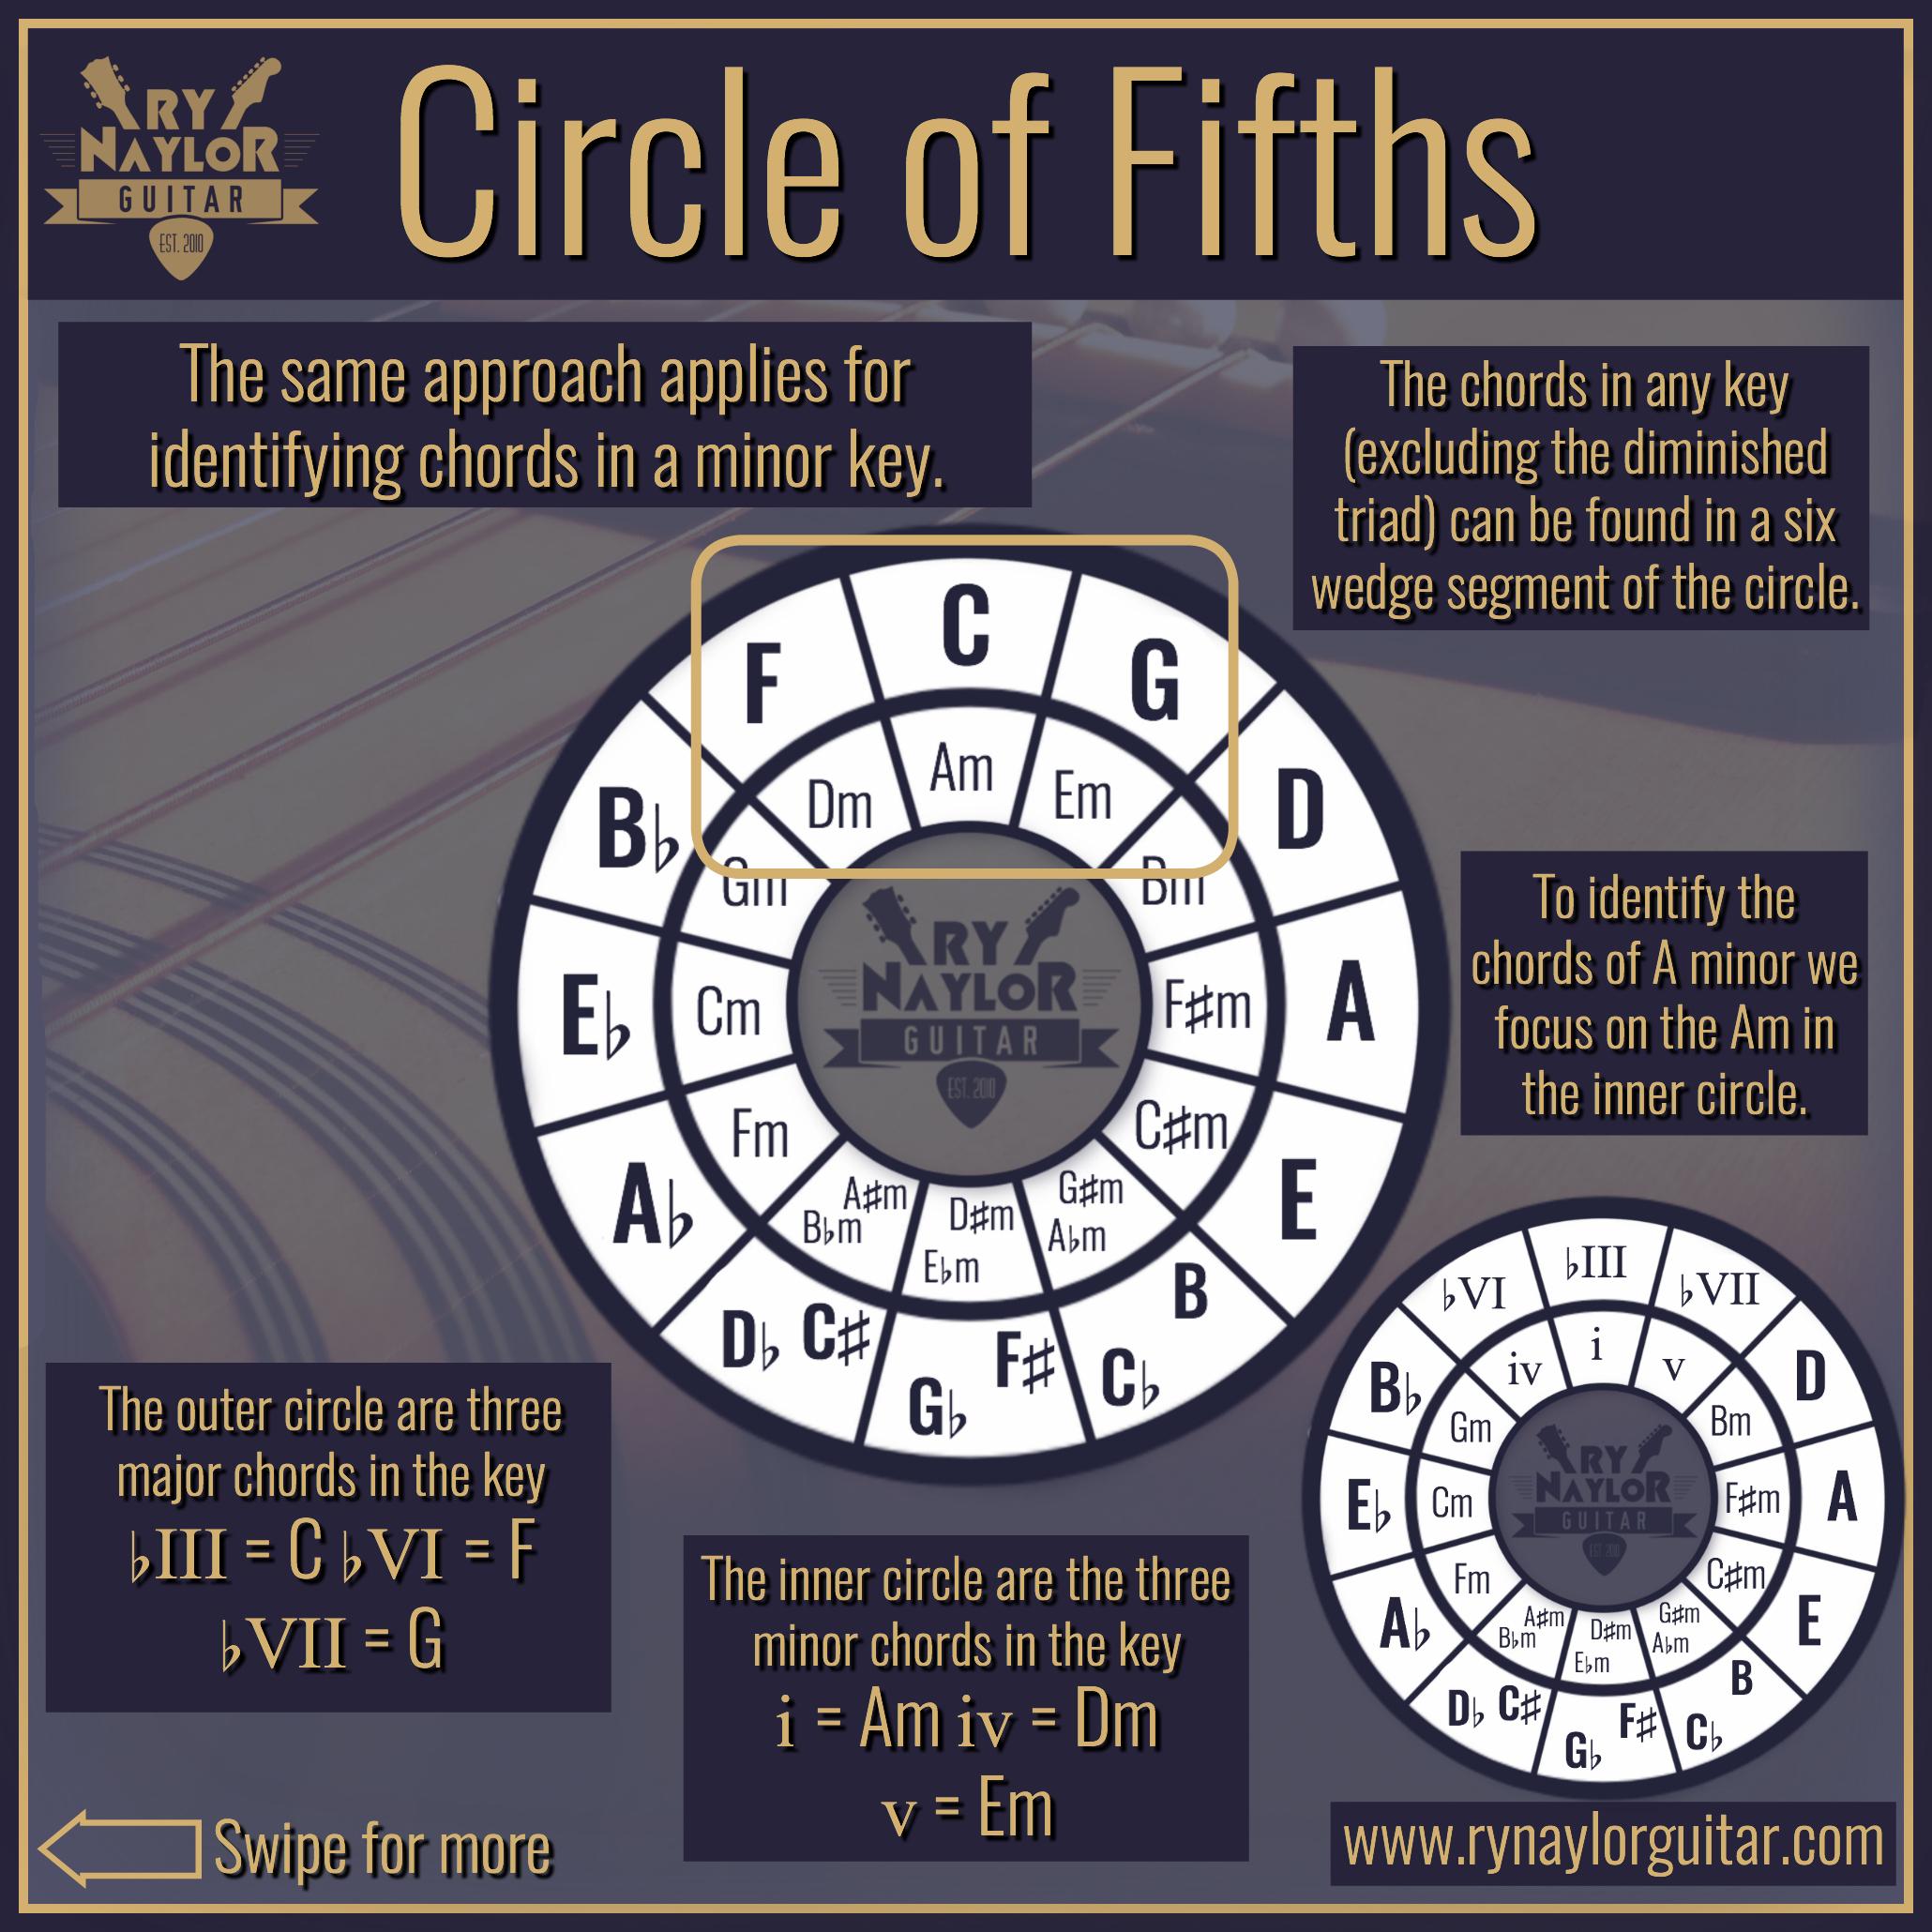 Circle of Fifths 9.jpg